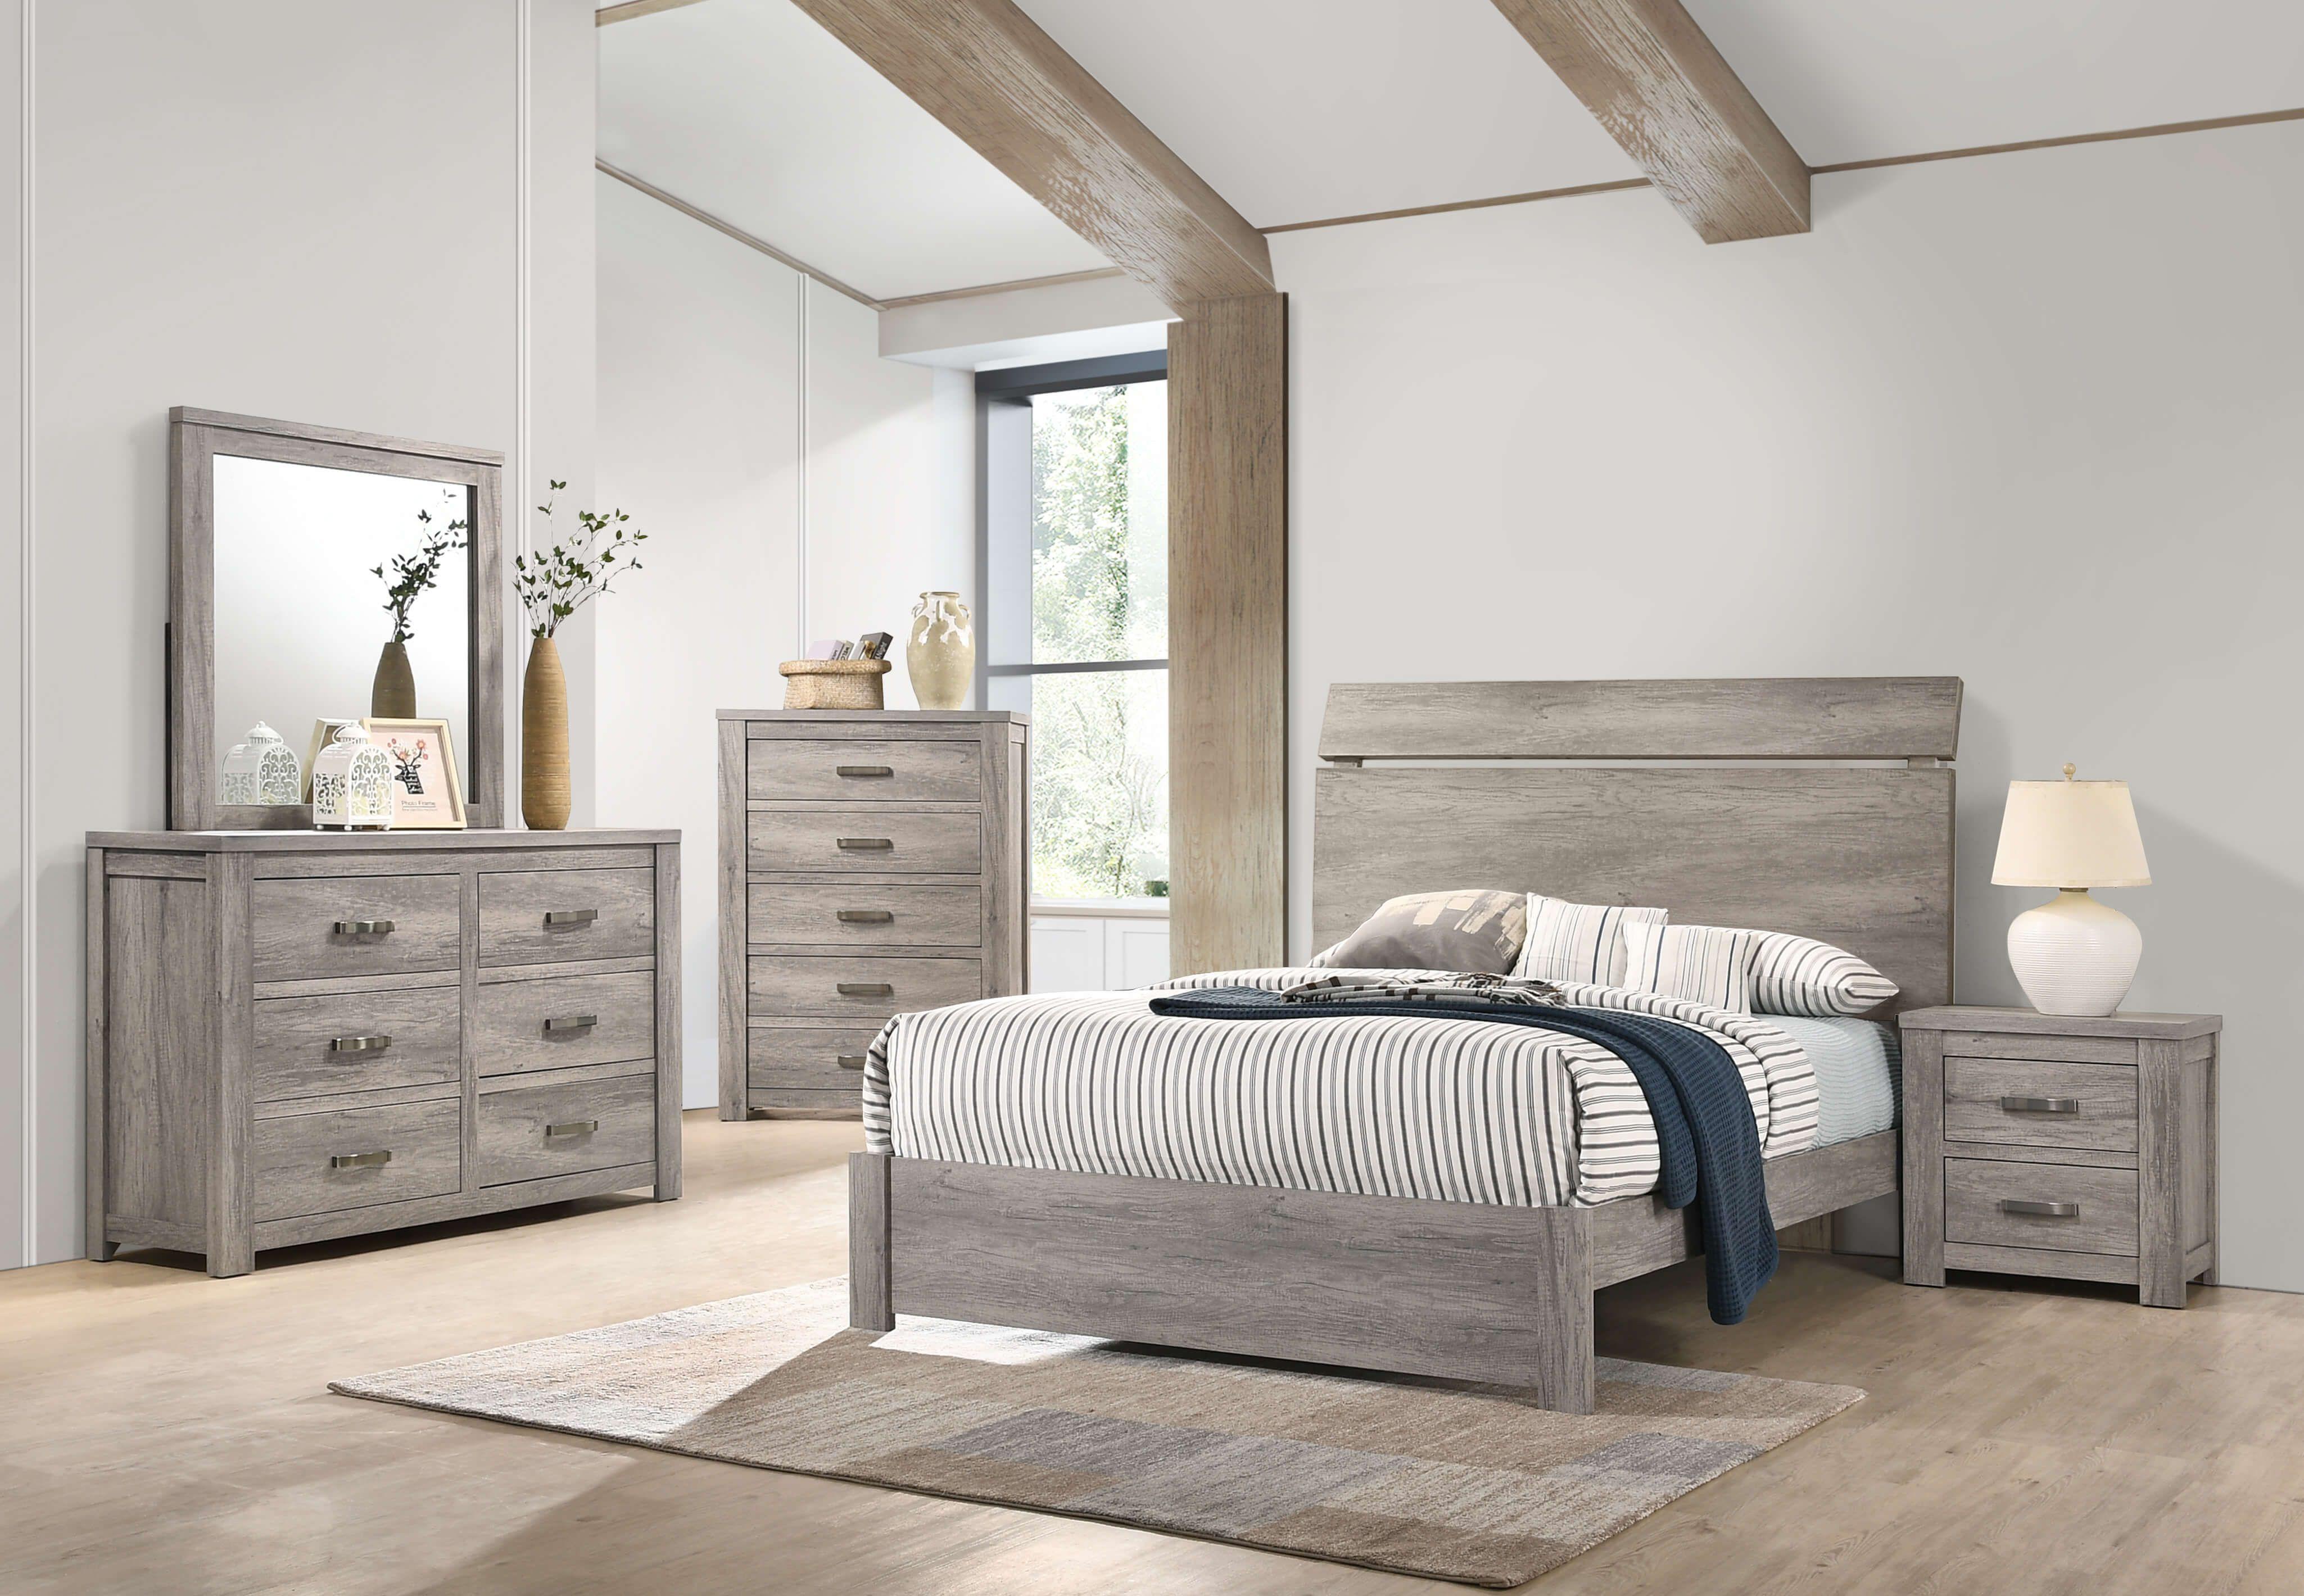 Ashby Bedroom Collection Furniture, Modern room, Bedroom